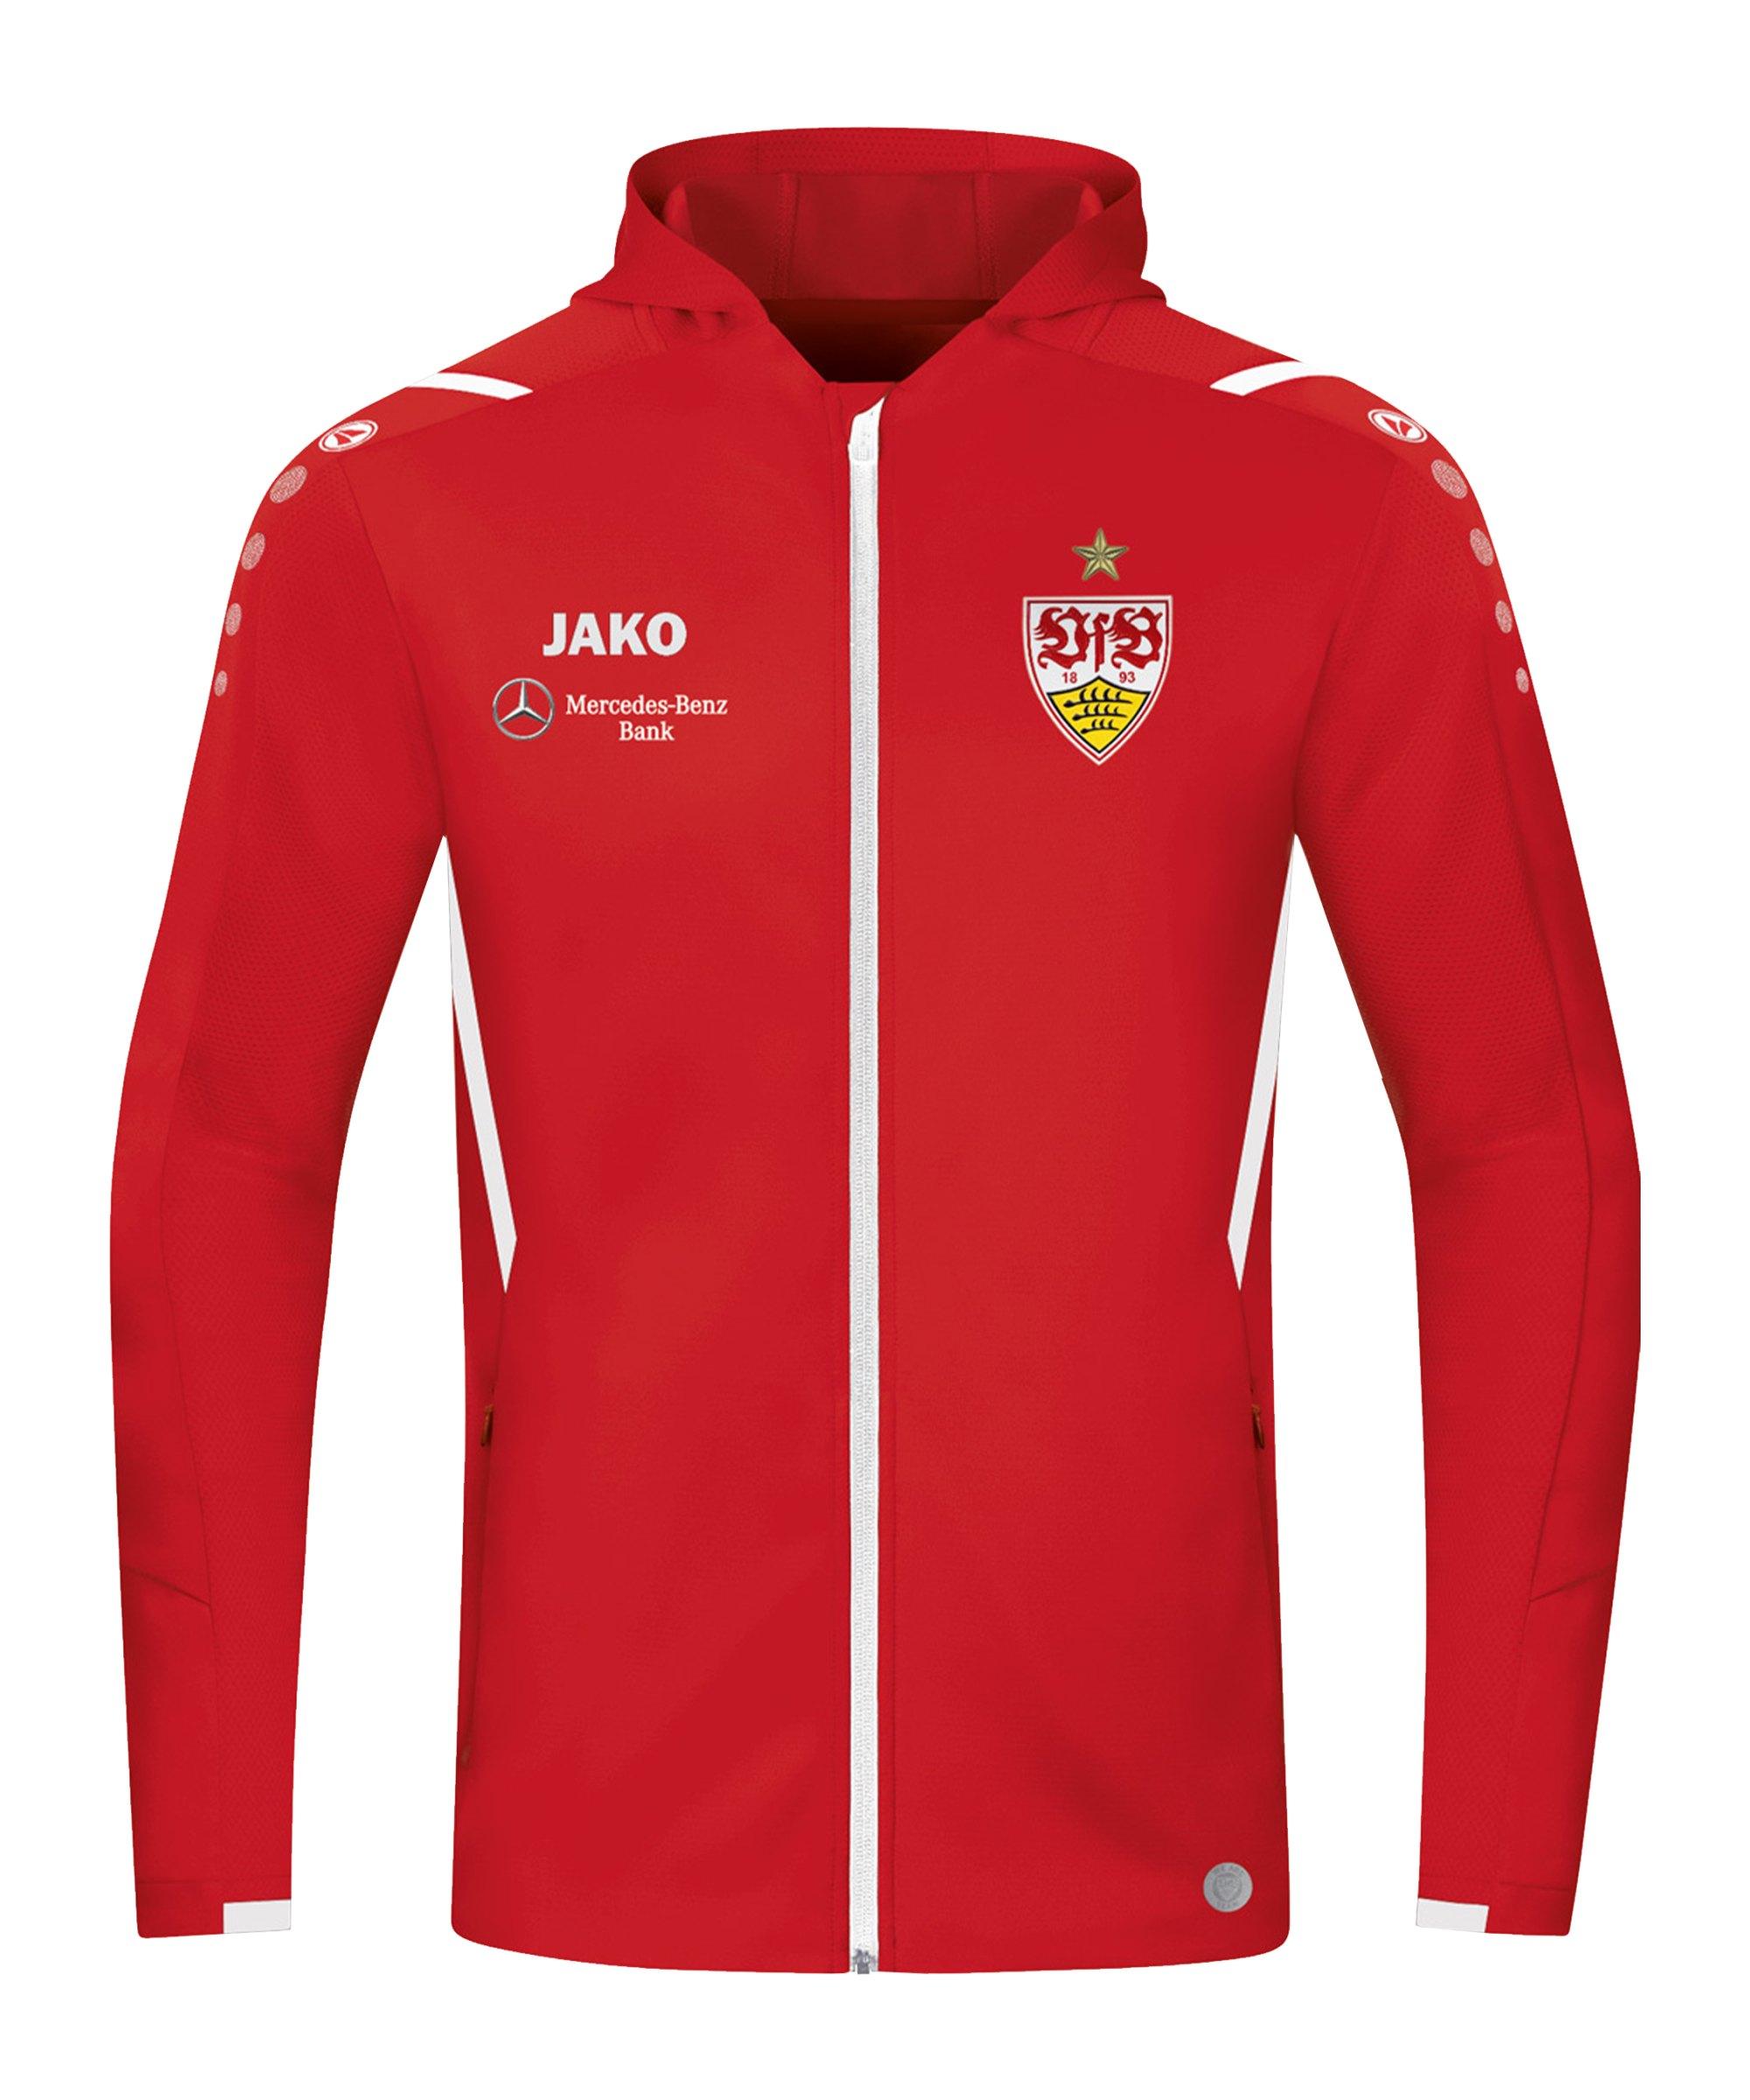 JAKO VfB Stuttgart Challenge Trainingsjacke Kids Rot Weiss F102 - rot